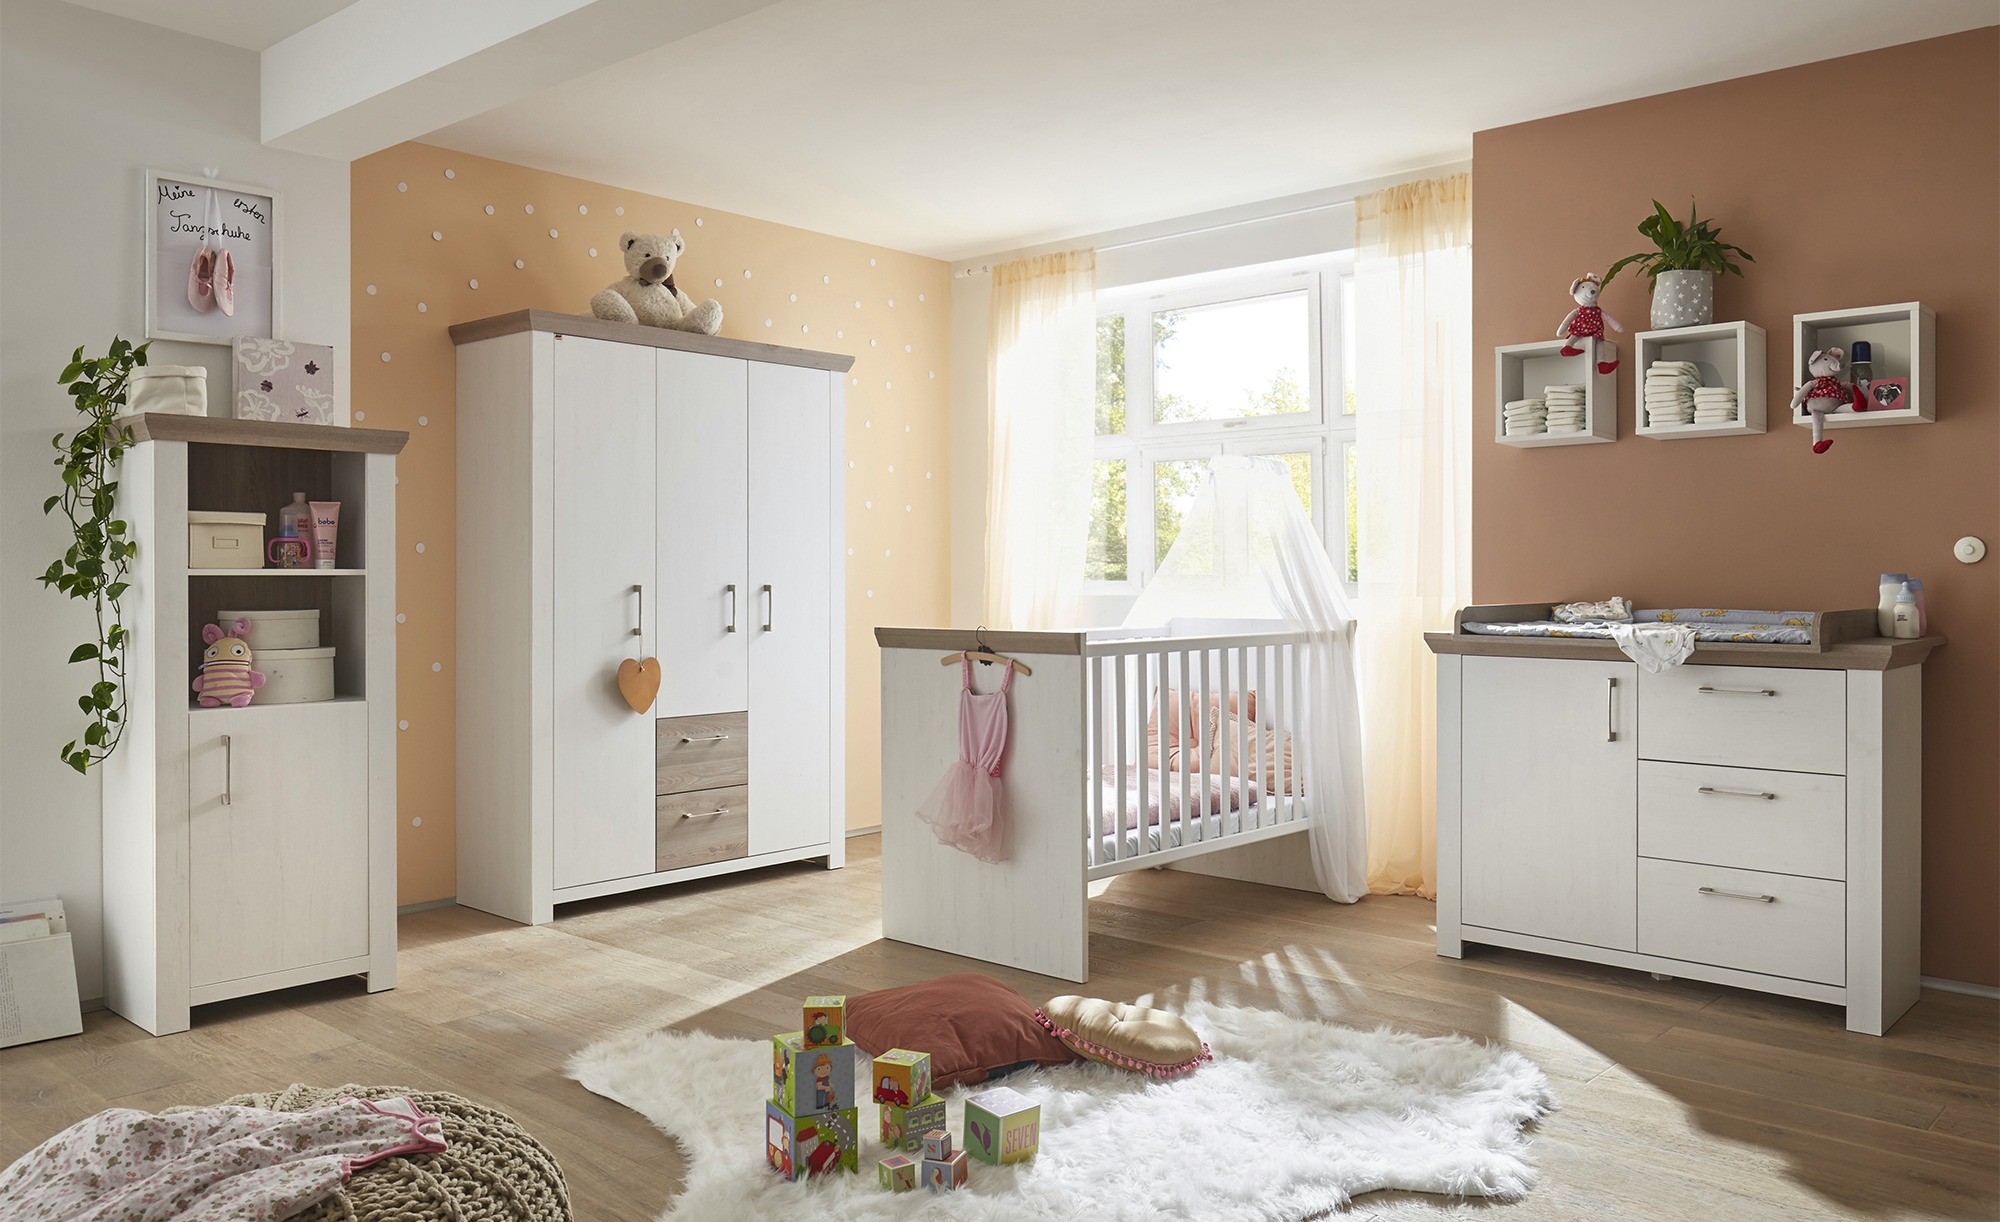 Full Size of Baby Kinderzimmer Komplett Babyzimmer Regale Komplette Schlafzimmer Günstige Guenstig Regal Günstig Bett Weiß Wohnzimmer Komplettes 180x200 Mit Lattenrost Kinderzimmer Baby Kinderzimmer Komplett